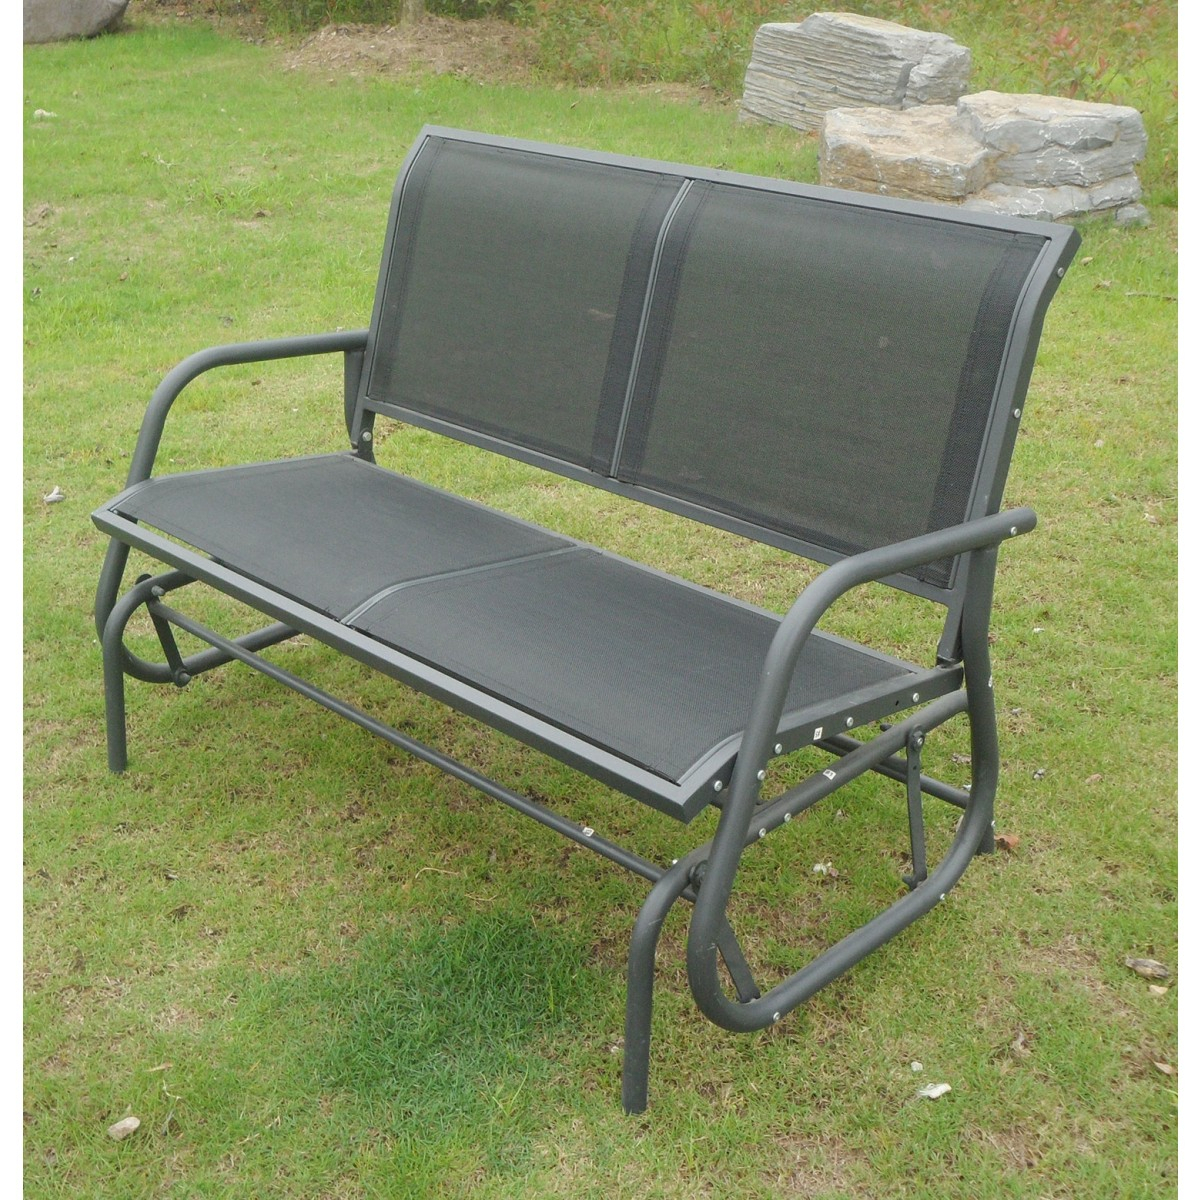 Grey Garden Seat 2 Seater Glider Rocking Bench & Mesh Inside Twin Seat Glider Benches (View 11 of 25)